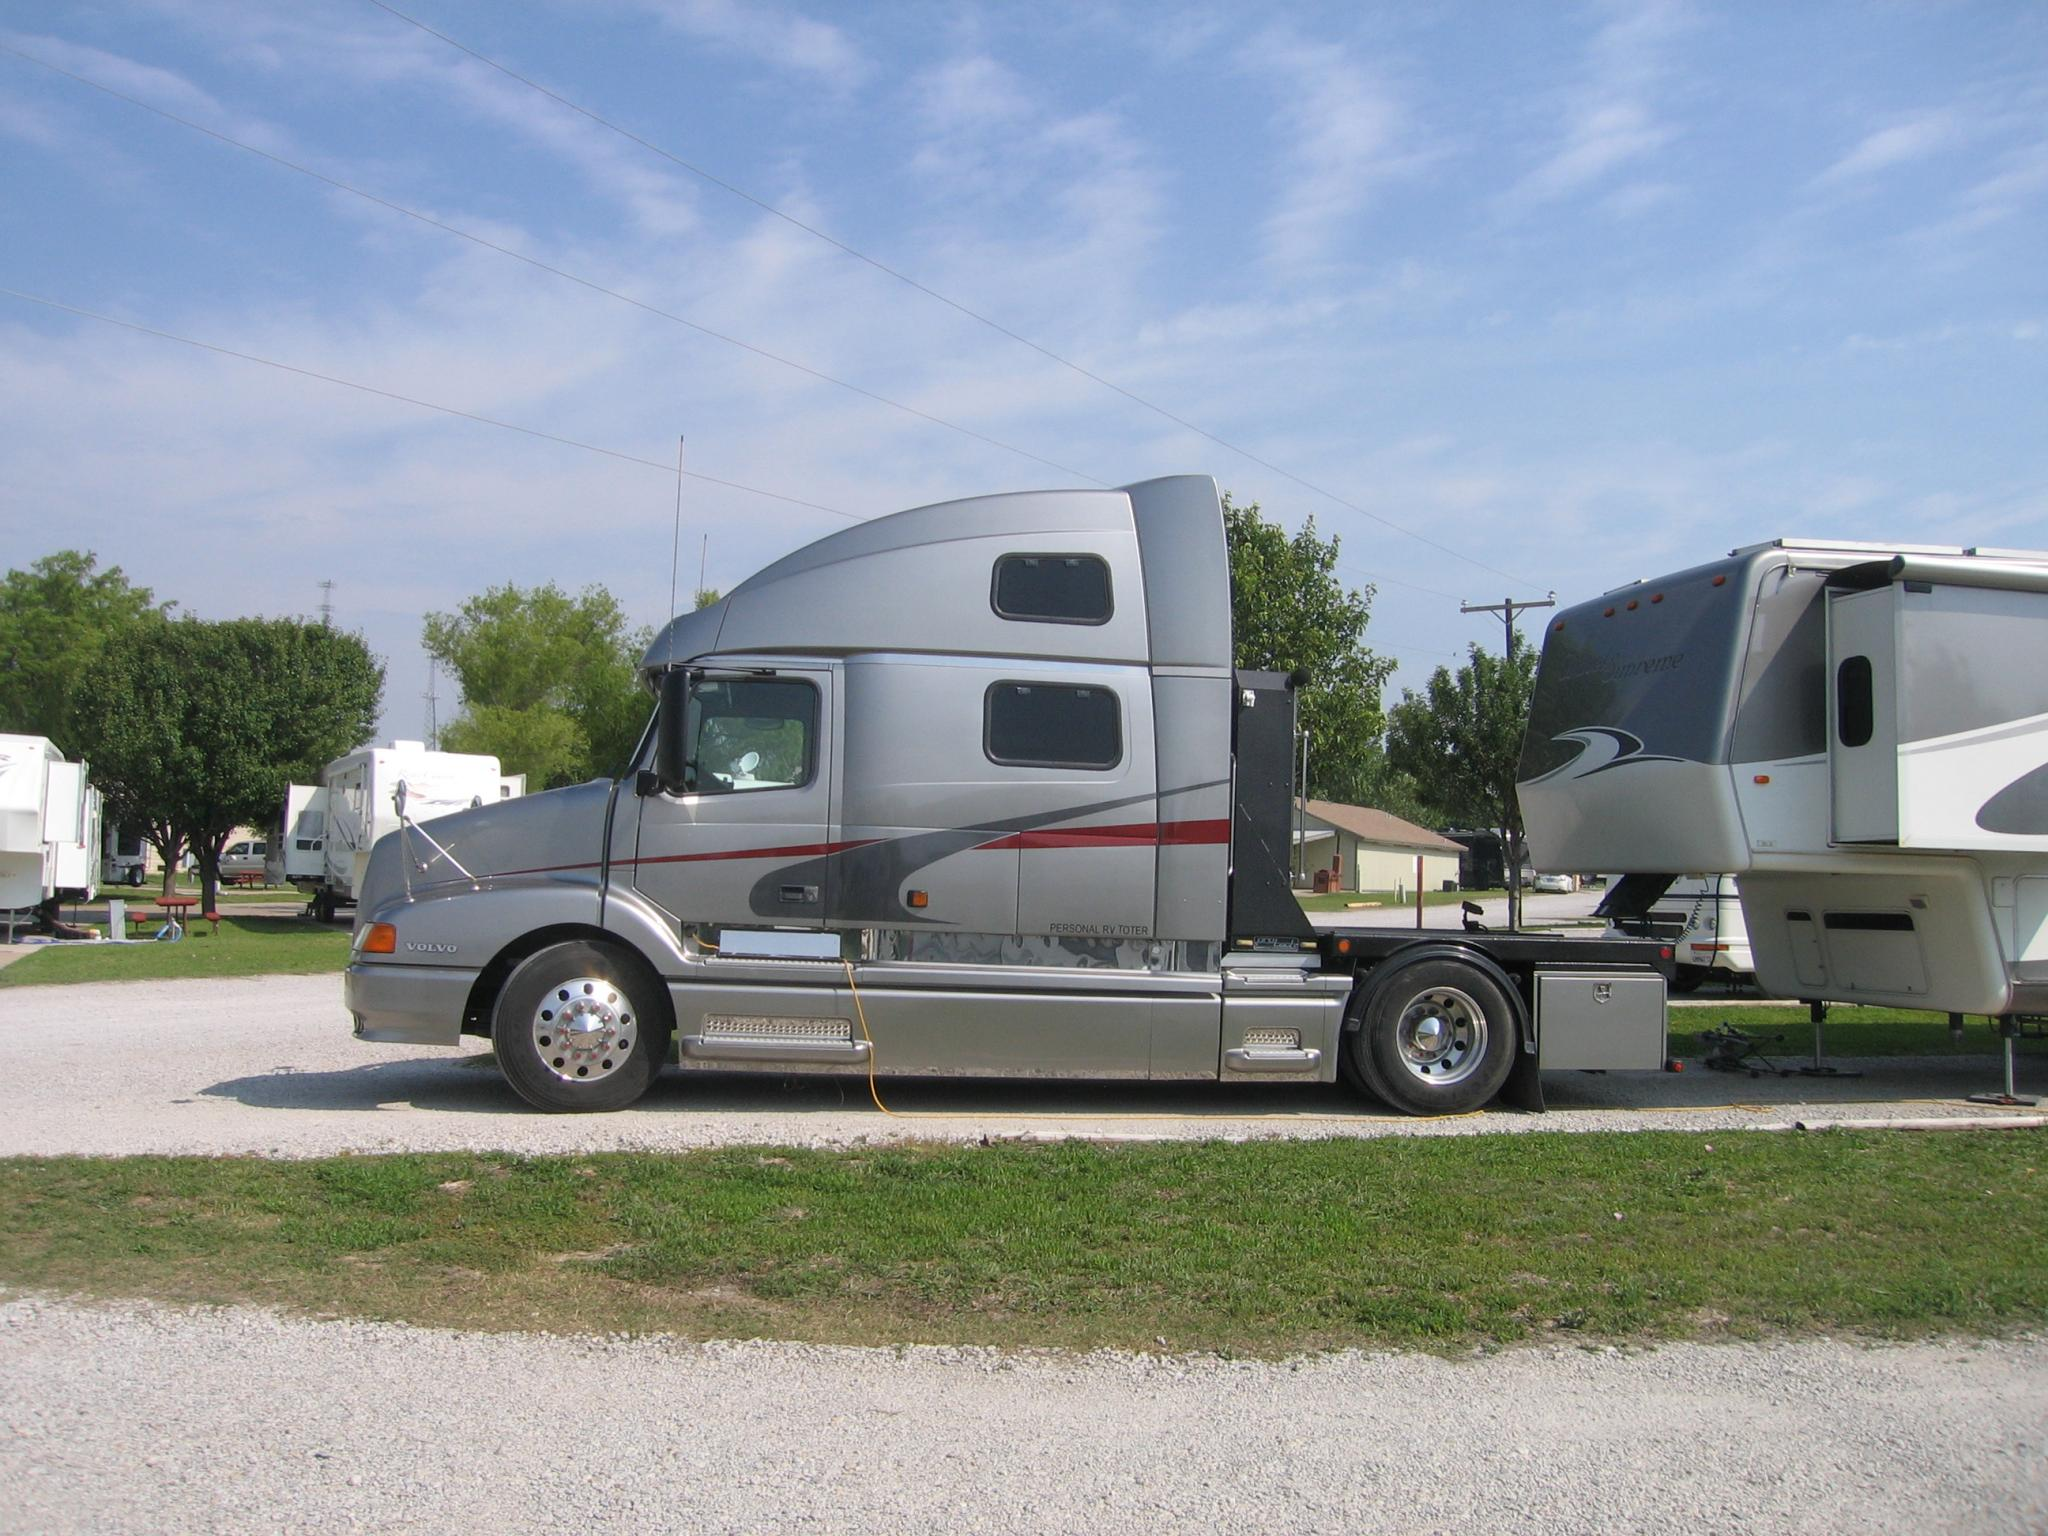 hdt truck company eastern international university became business school sclm 429 transportation and logistics management case study 1 date: december.